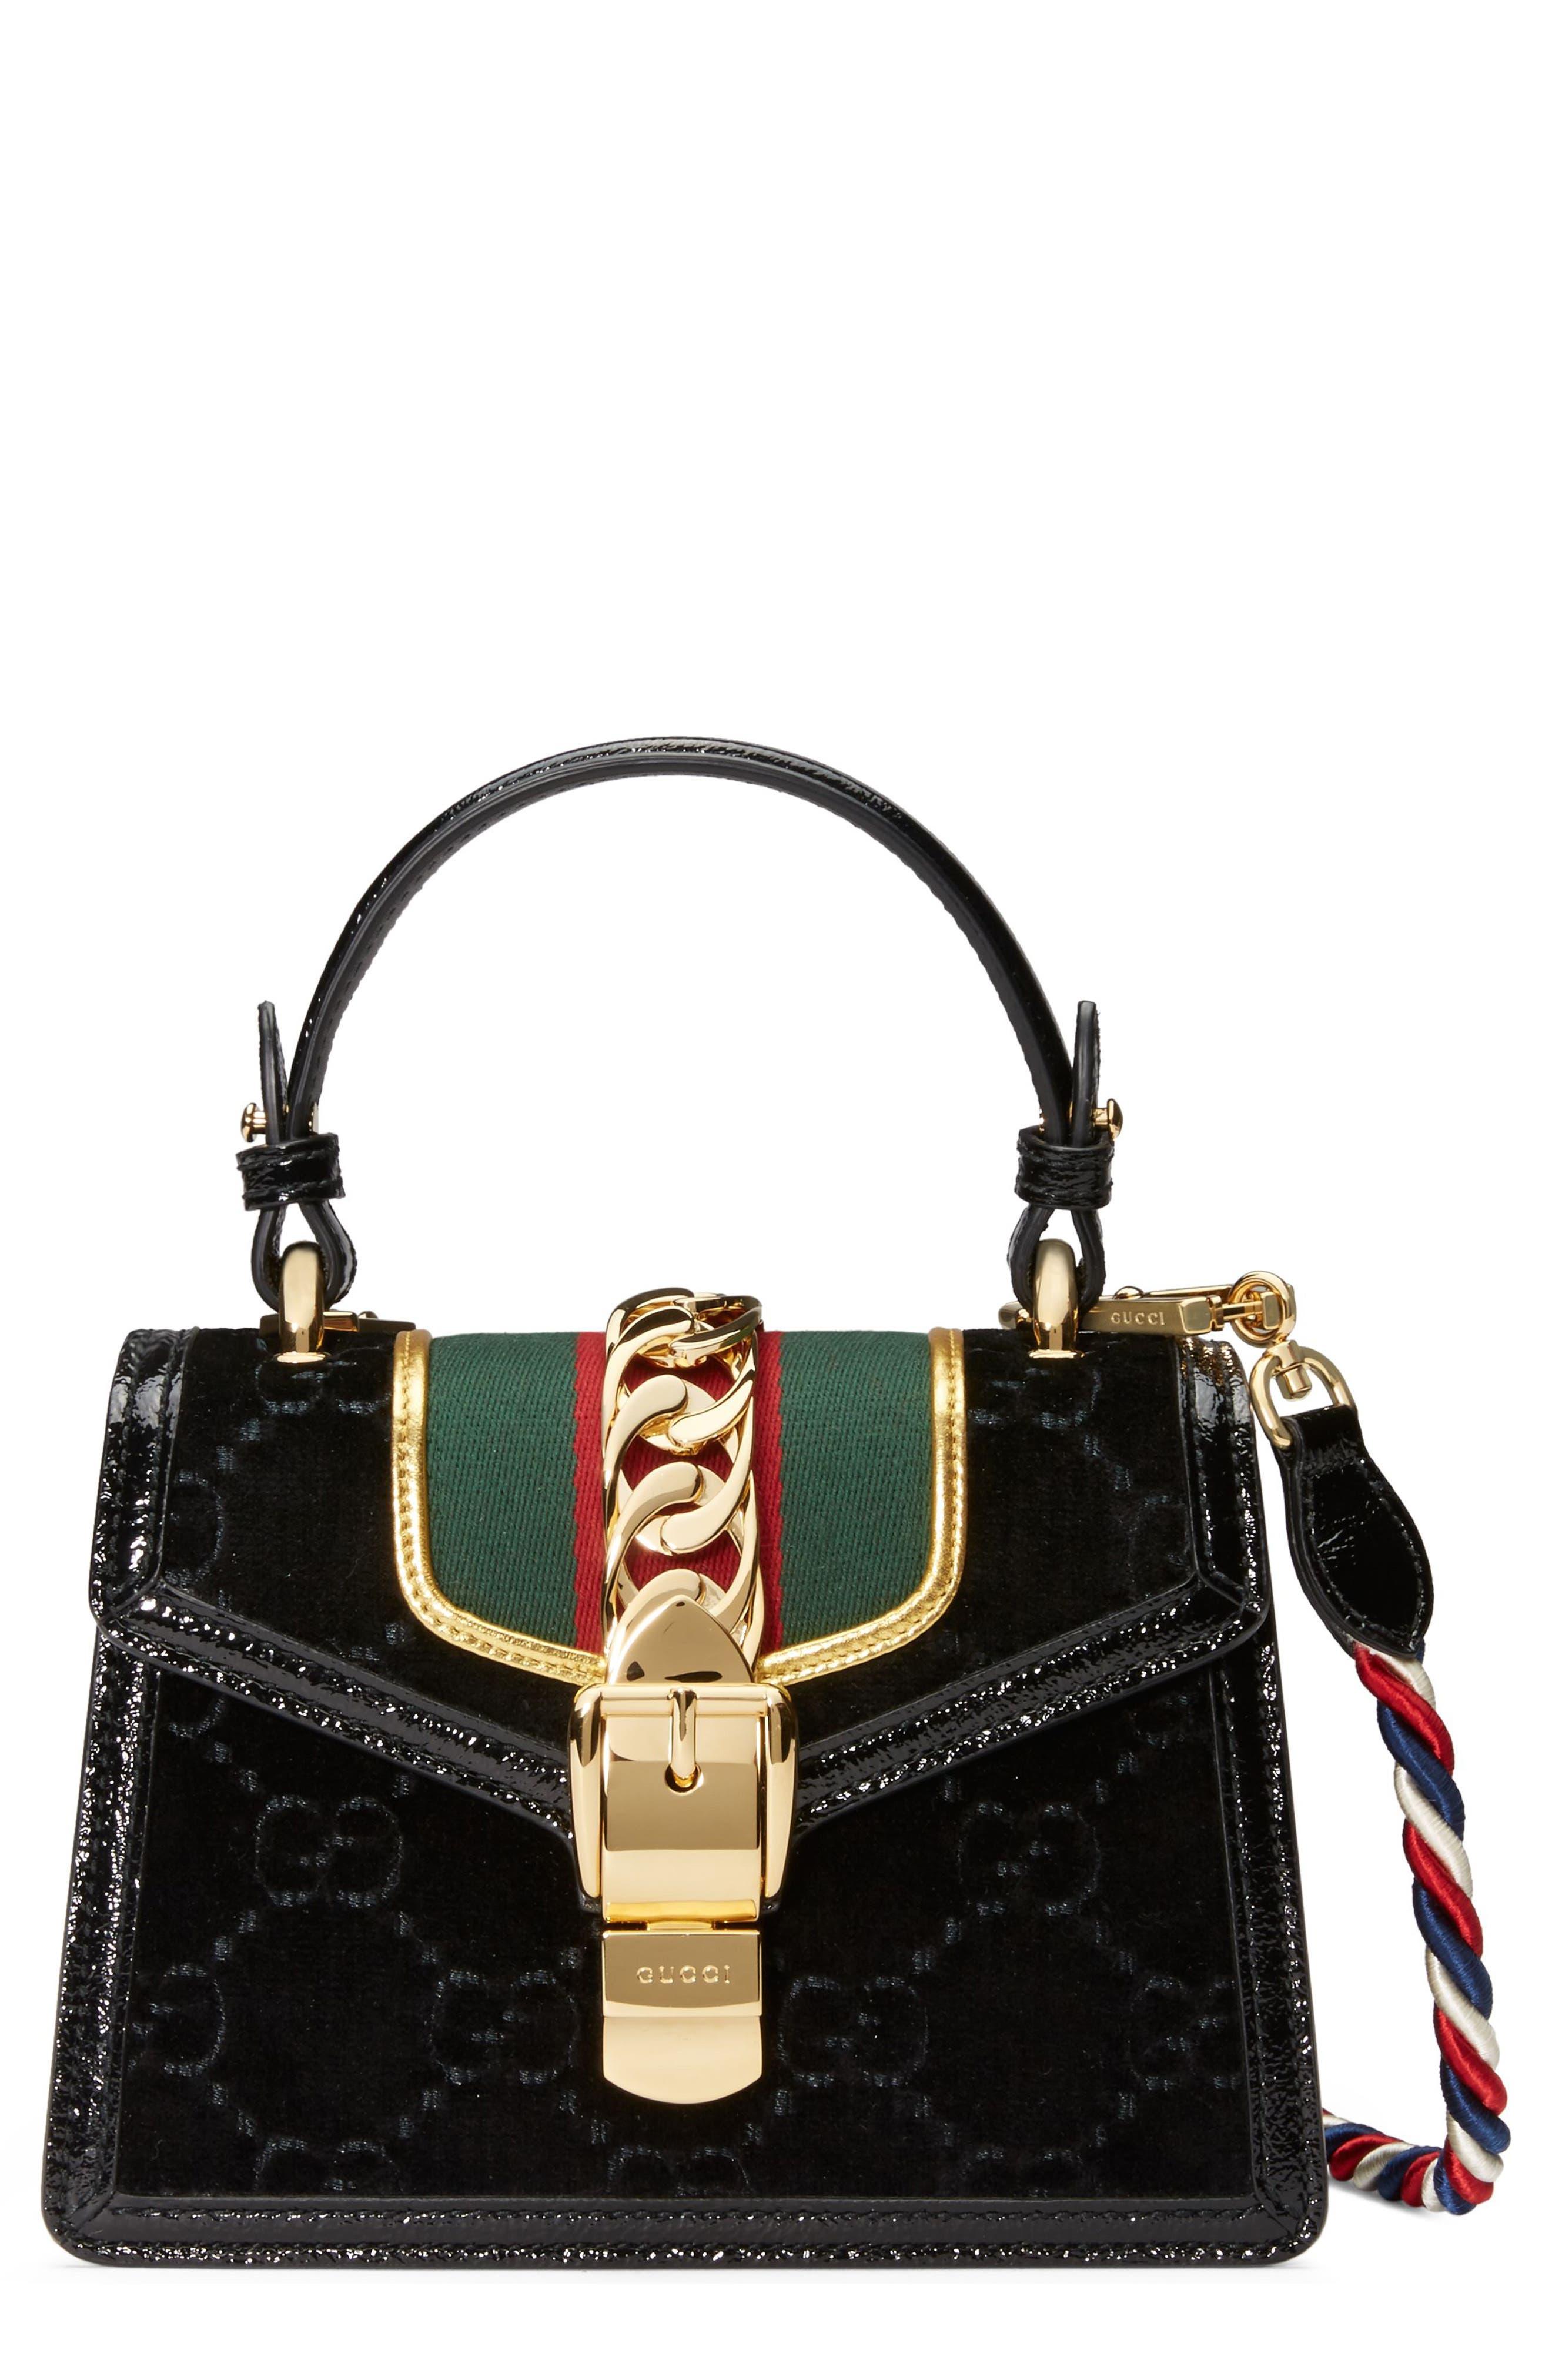 Mini Sylvie Velvet Top Handle Bag,                         Main,                         color, NERO/ VERT RED/ MYSTIC WHITE